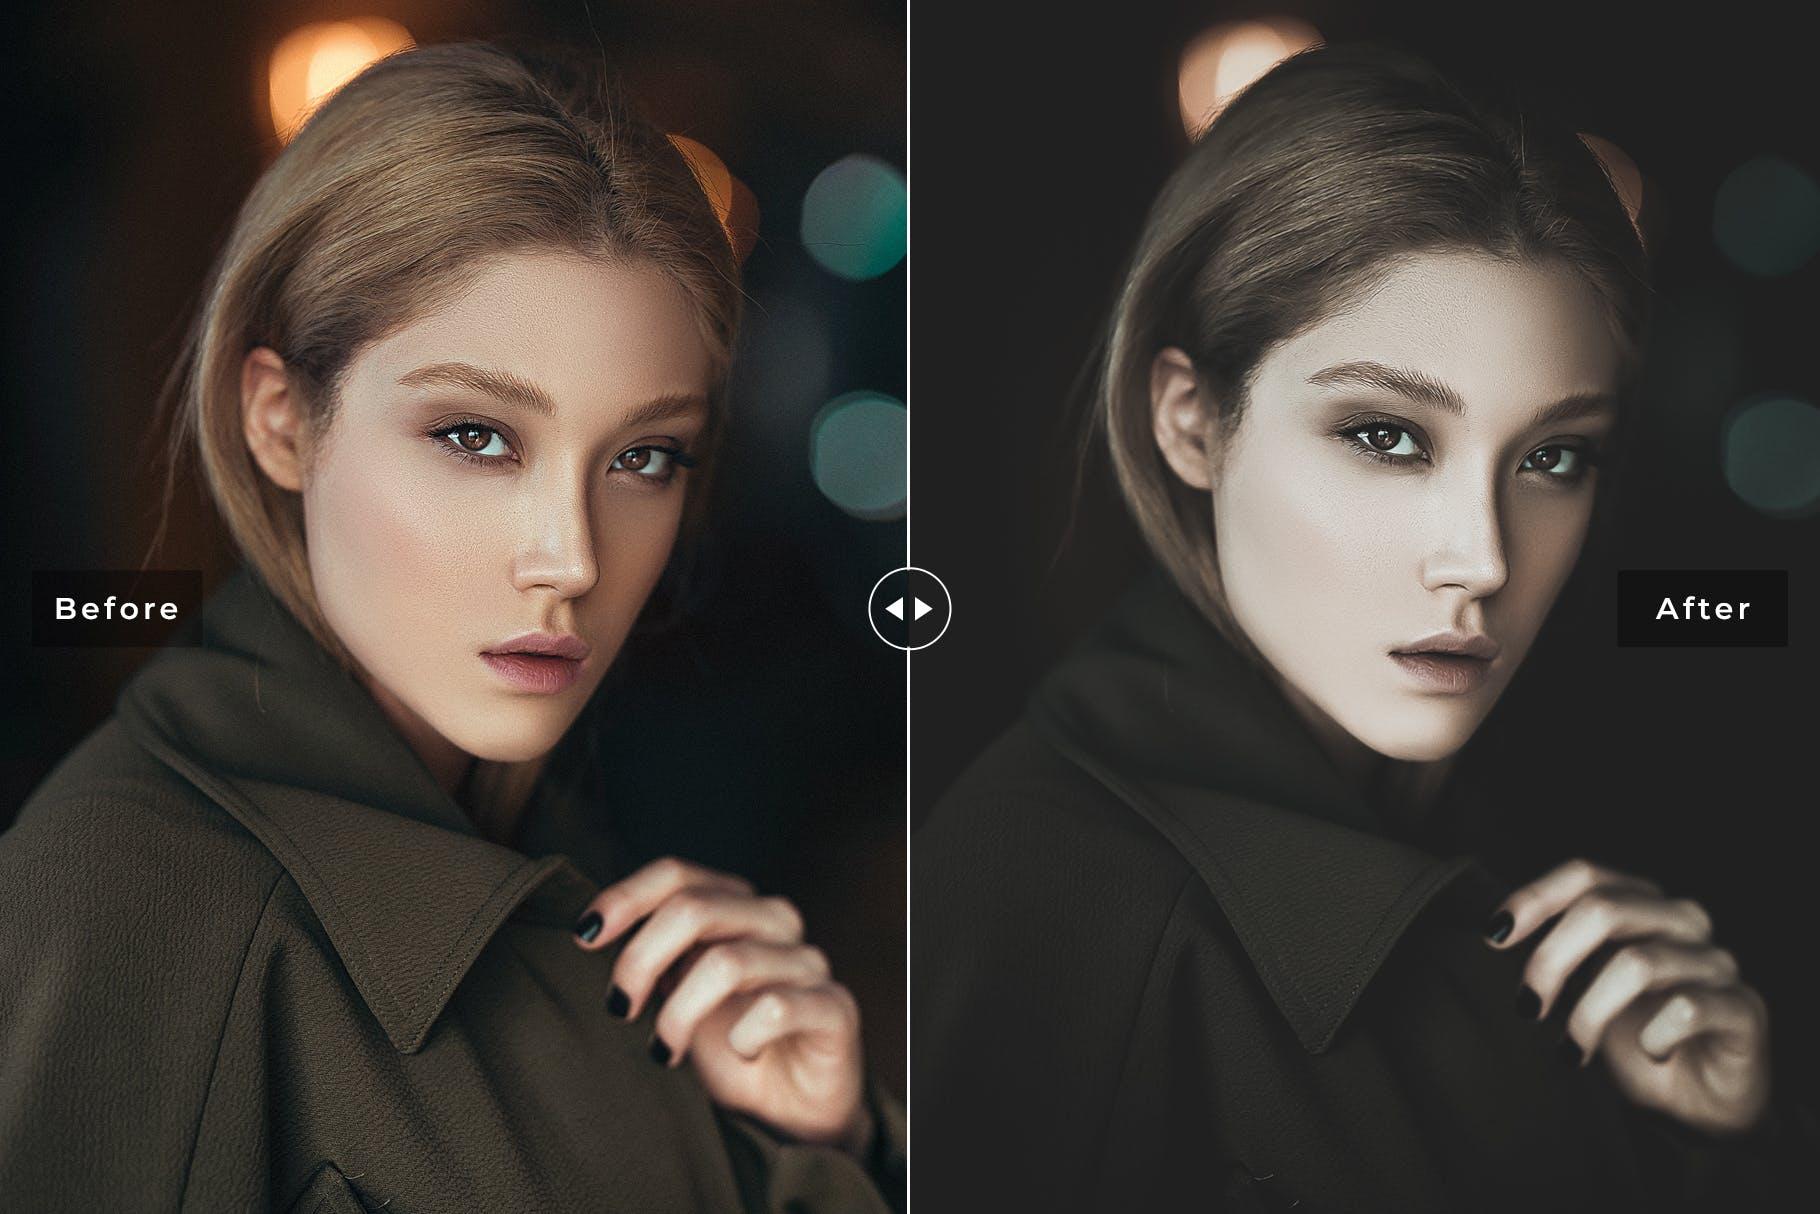 电影效果色调场景胶片效果处理LR预设Film Effect Mobile Desktop Lightroom Presets插图(1)